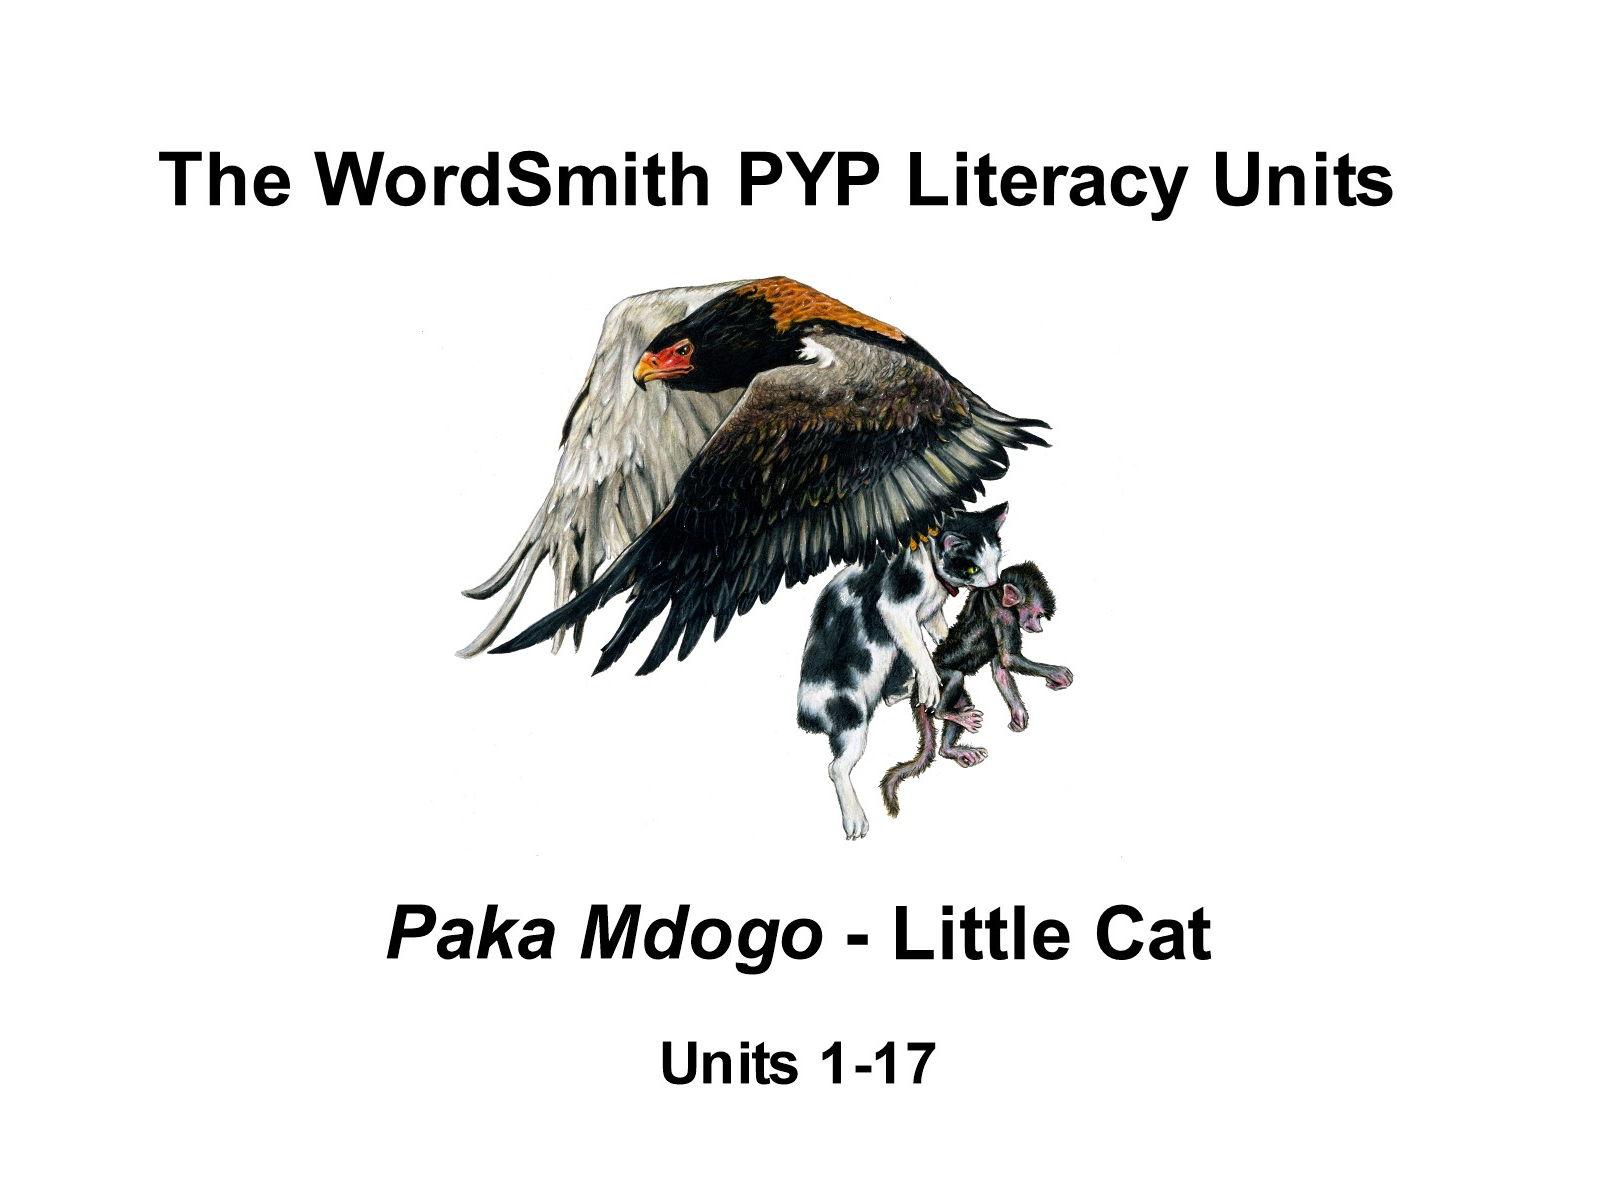 The WordSmith PYP Literacy Units 1-17